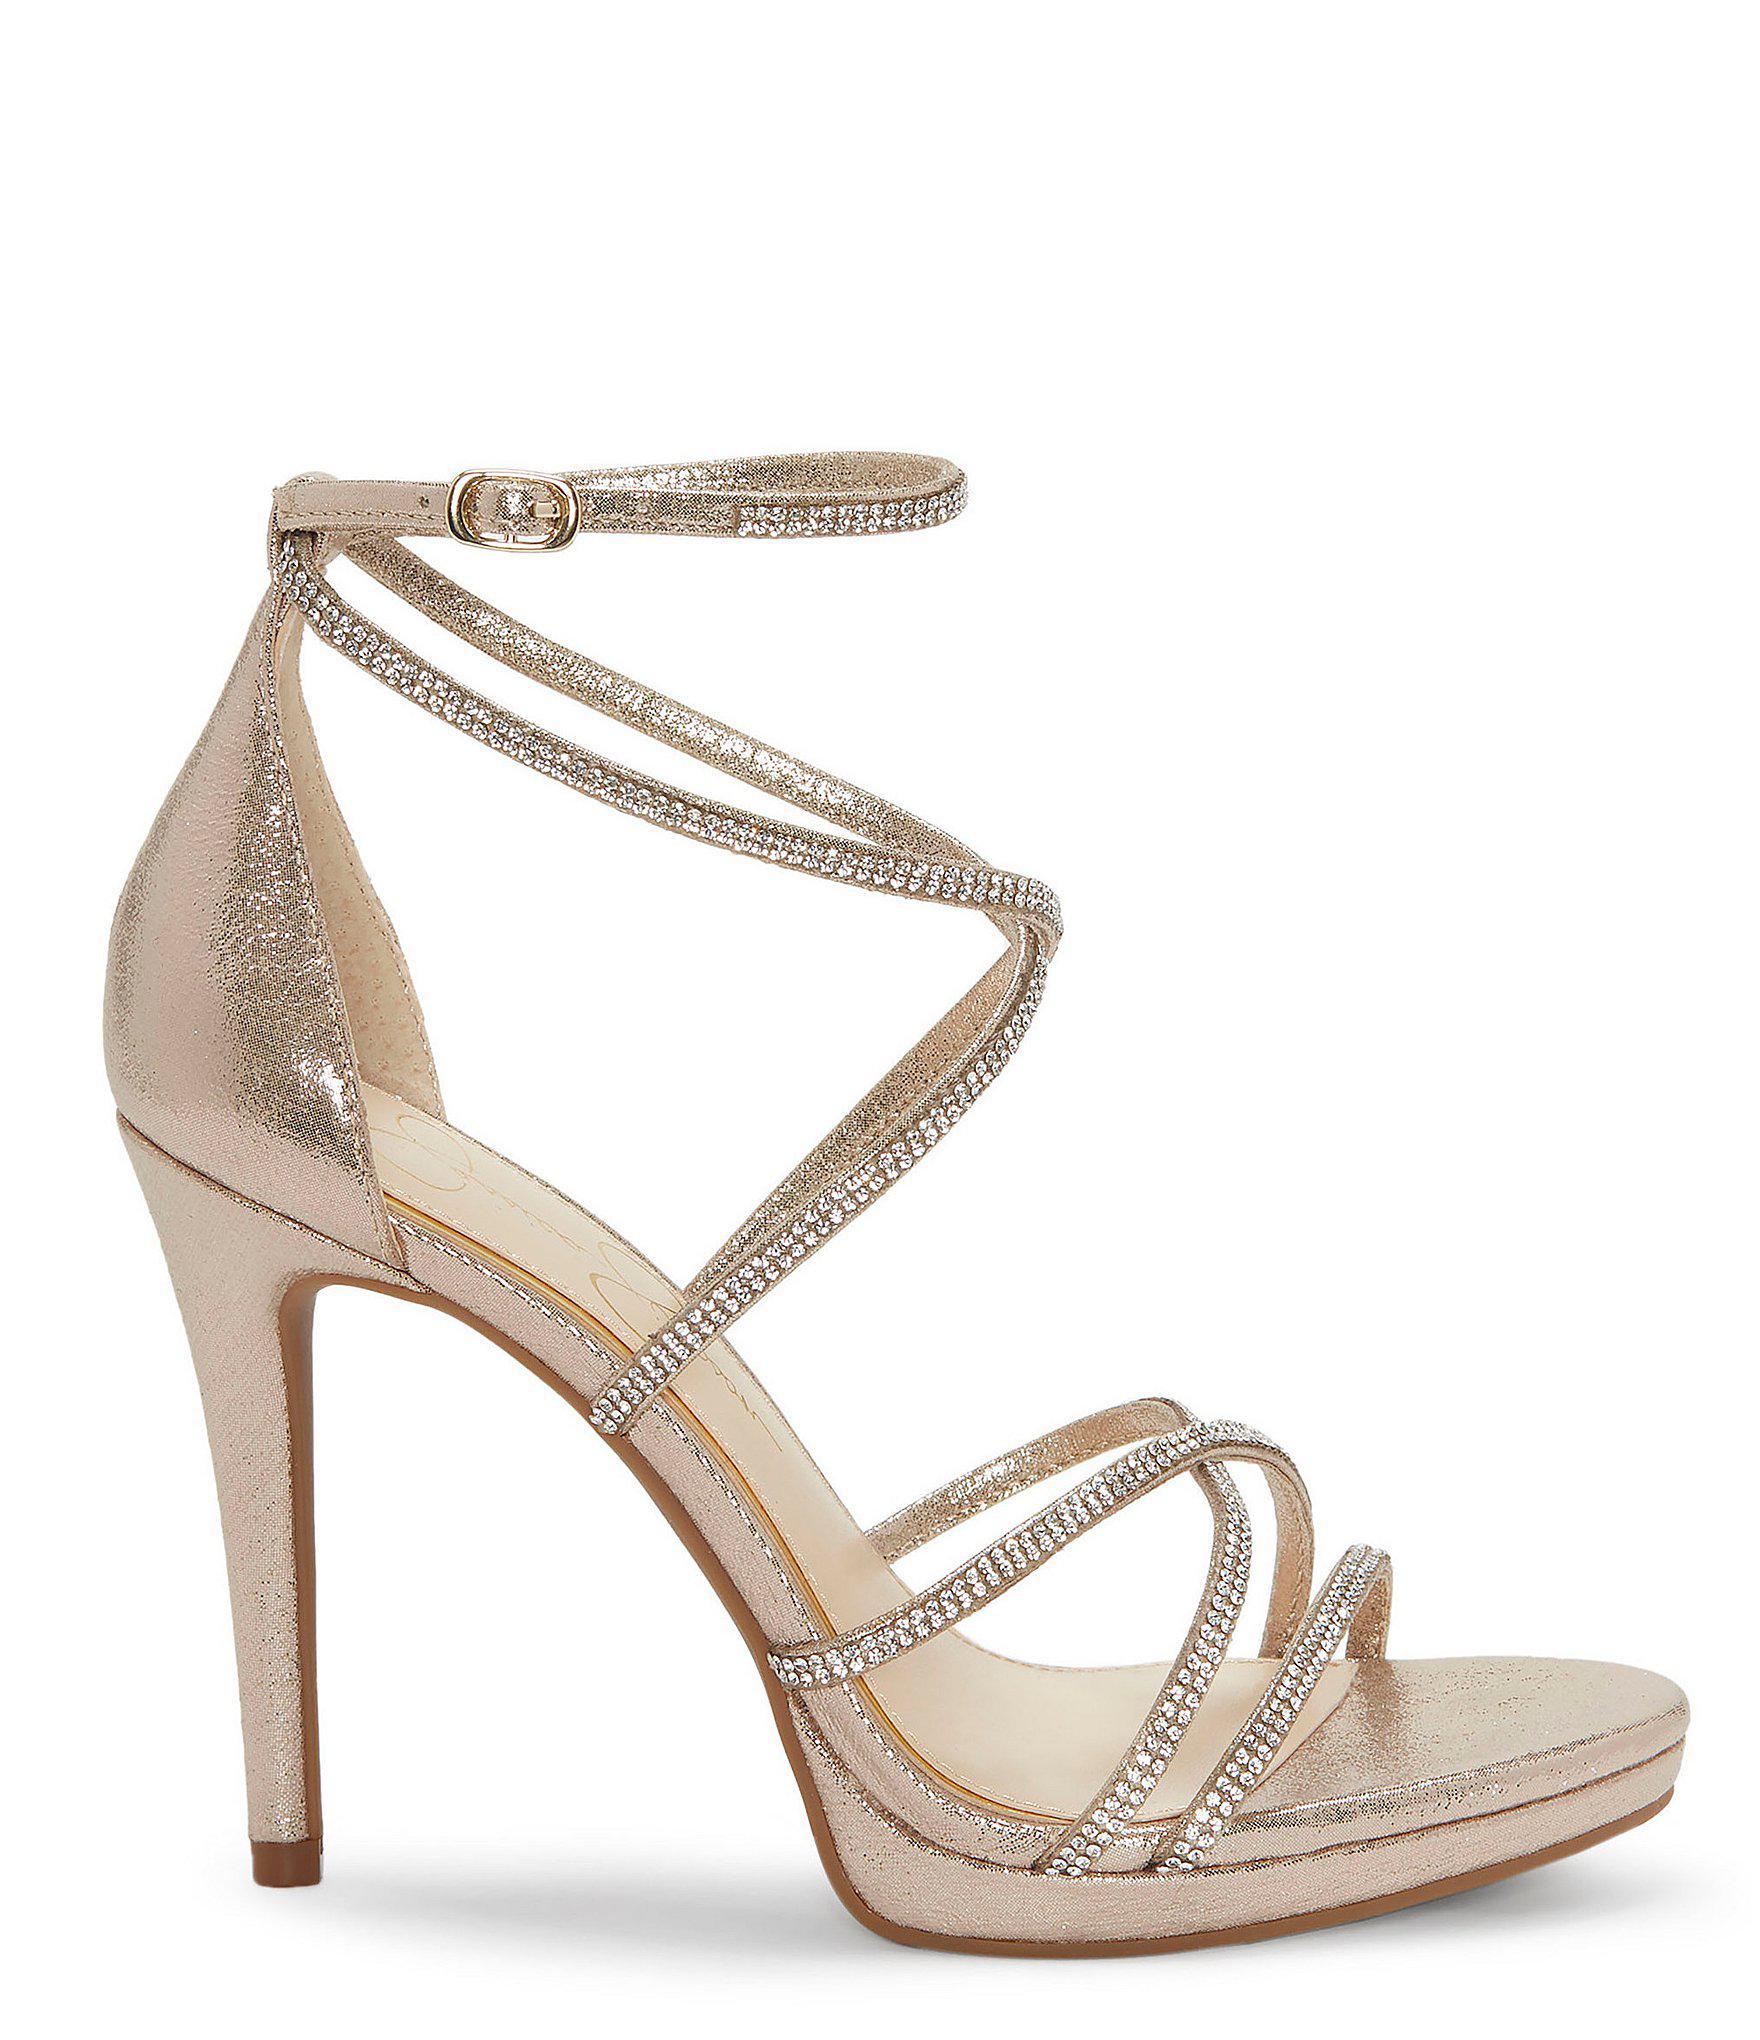 29b56c7741c5 Jessica Simpson - Metallic Jaeya Rhinestone Strappy Dress Sandals - Lyst.  View fullscreen